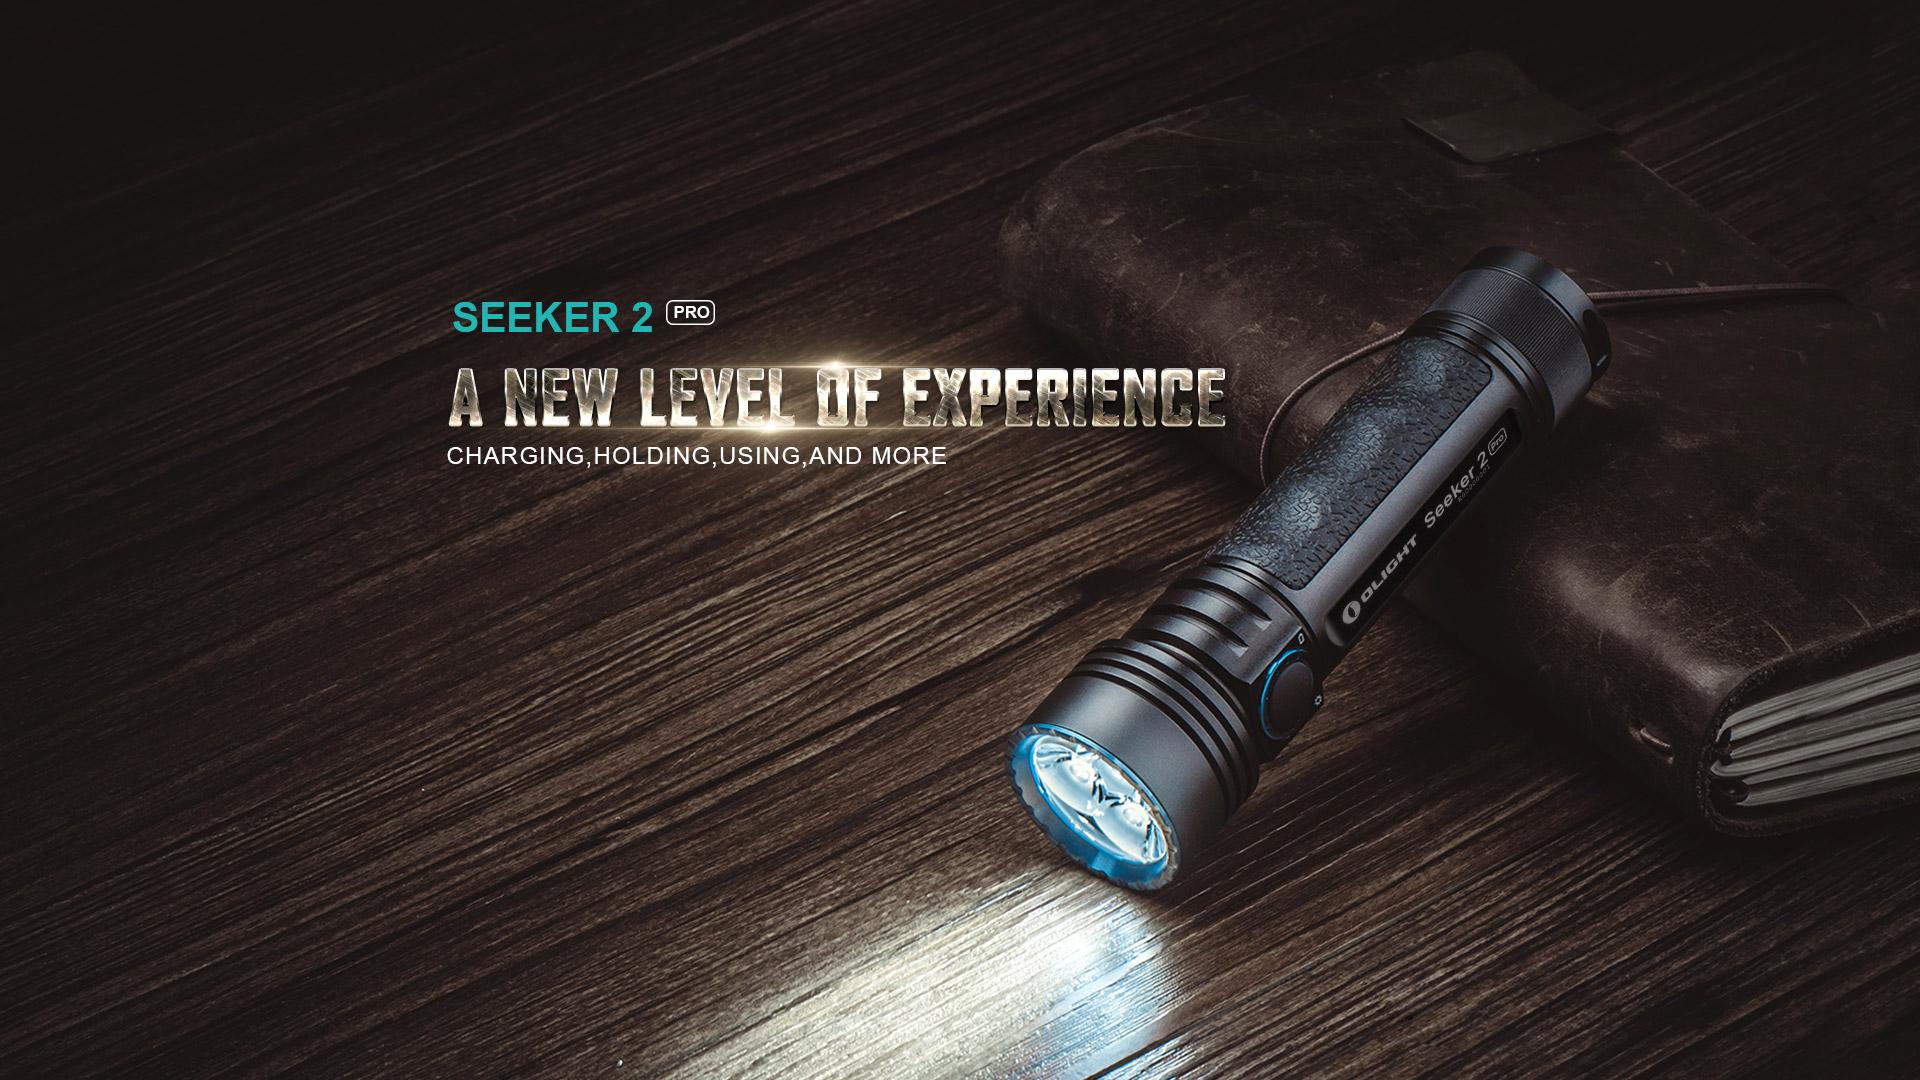 Seeker 2 PRO Rechargeable LED Flashlight